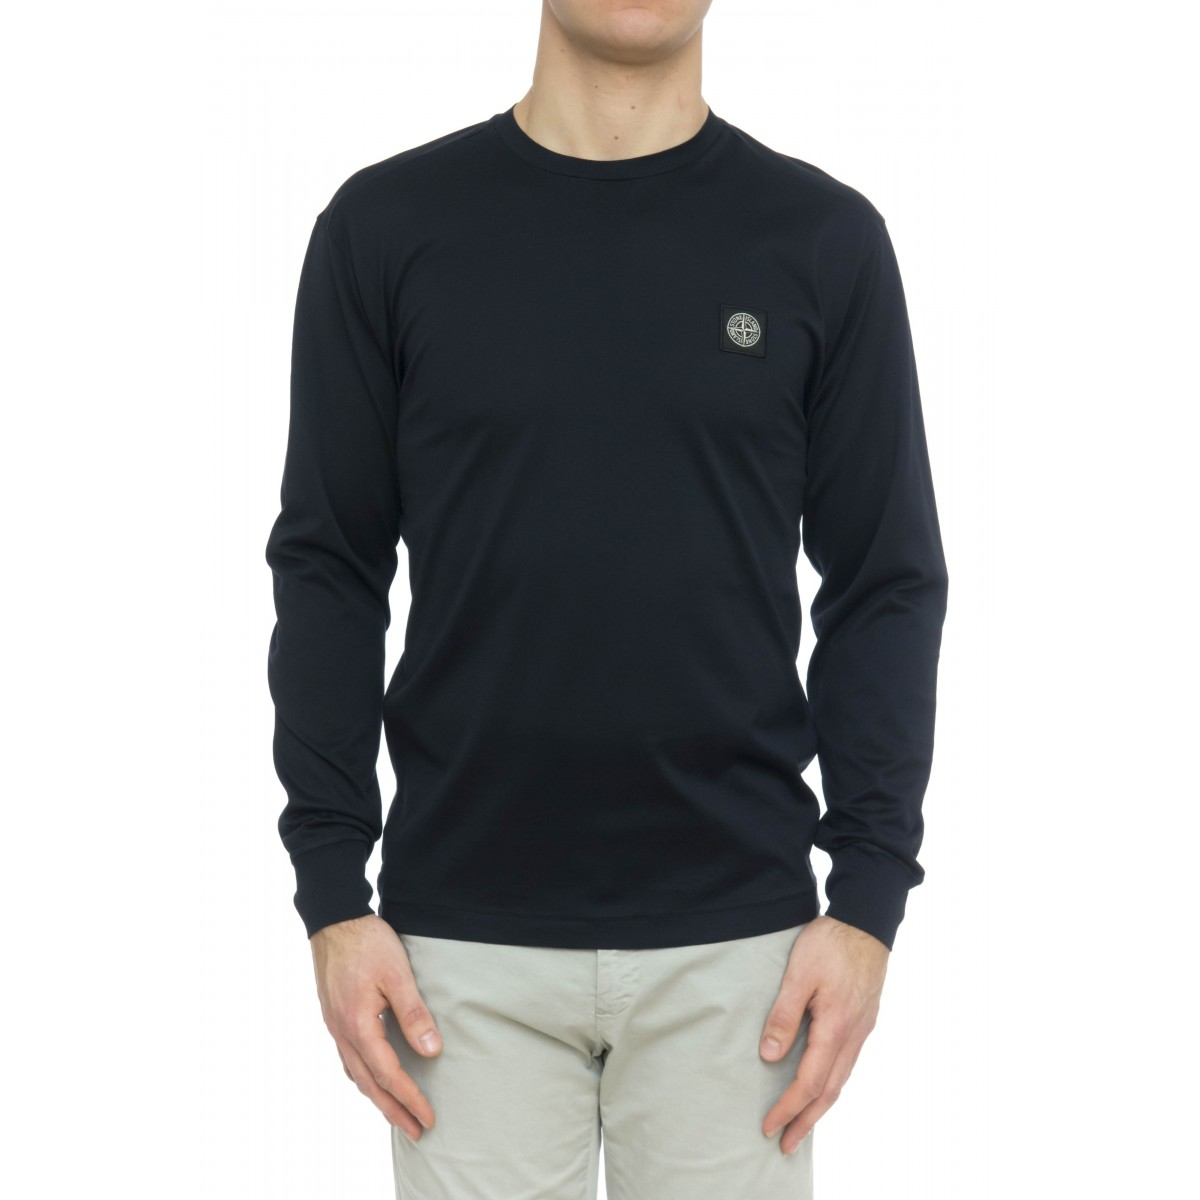 T-shirt uomo - 22713 t-shirt manica lunga